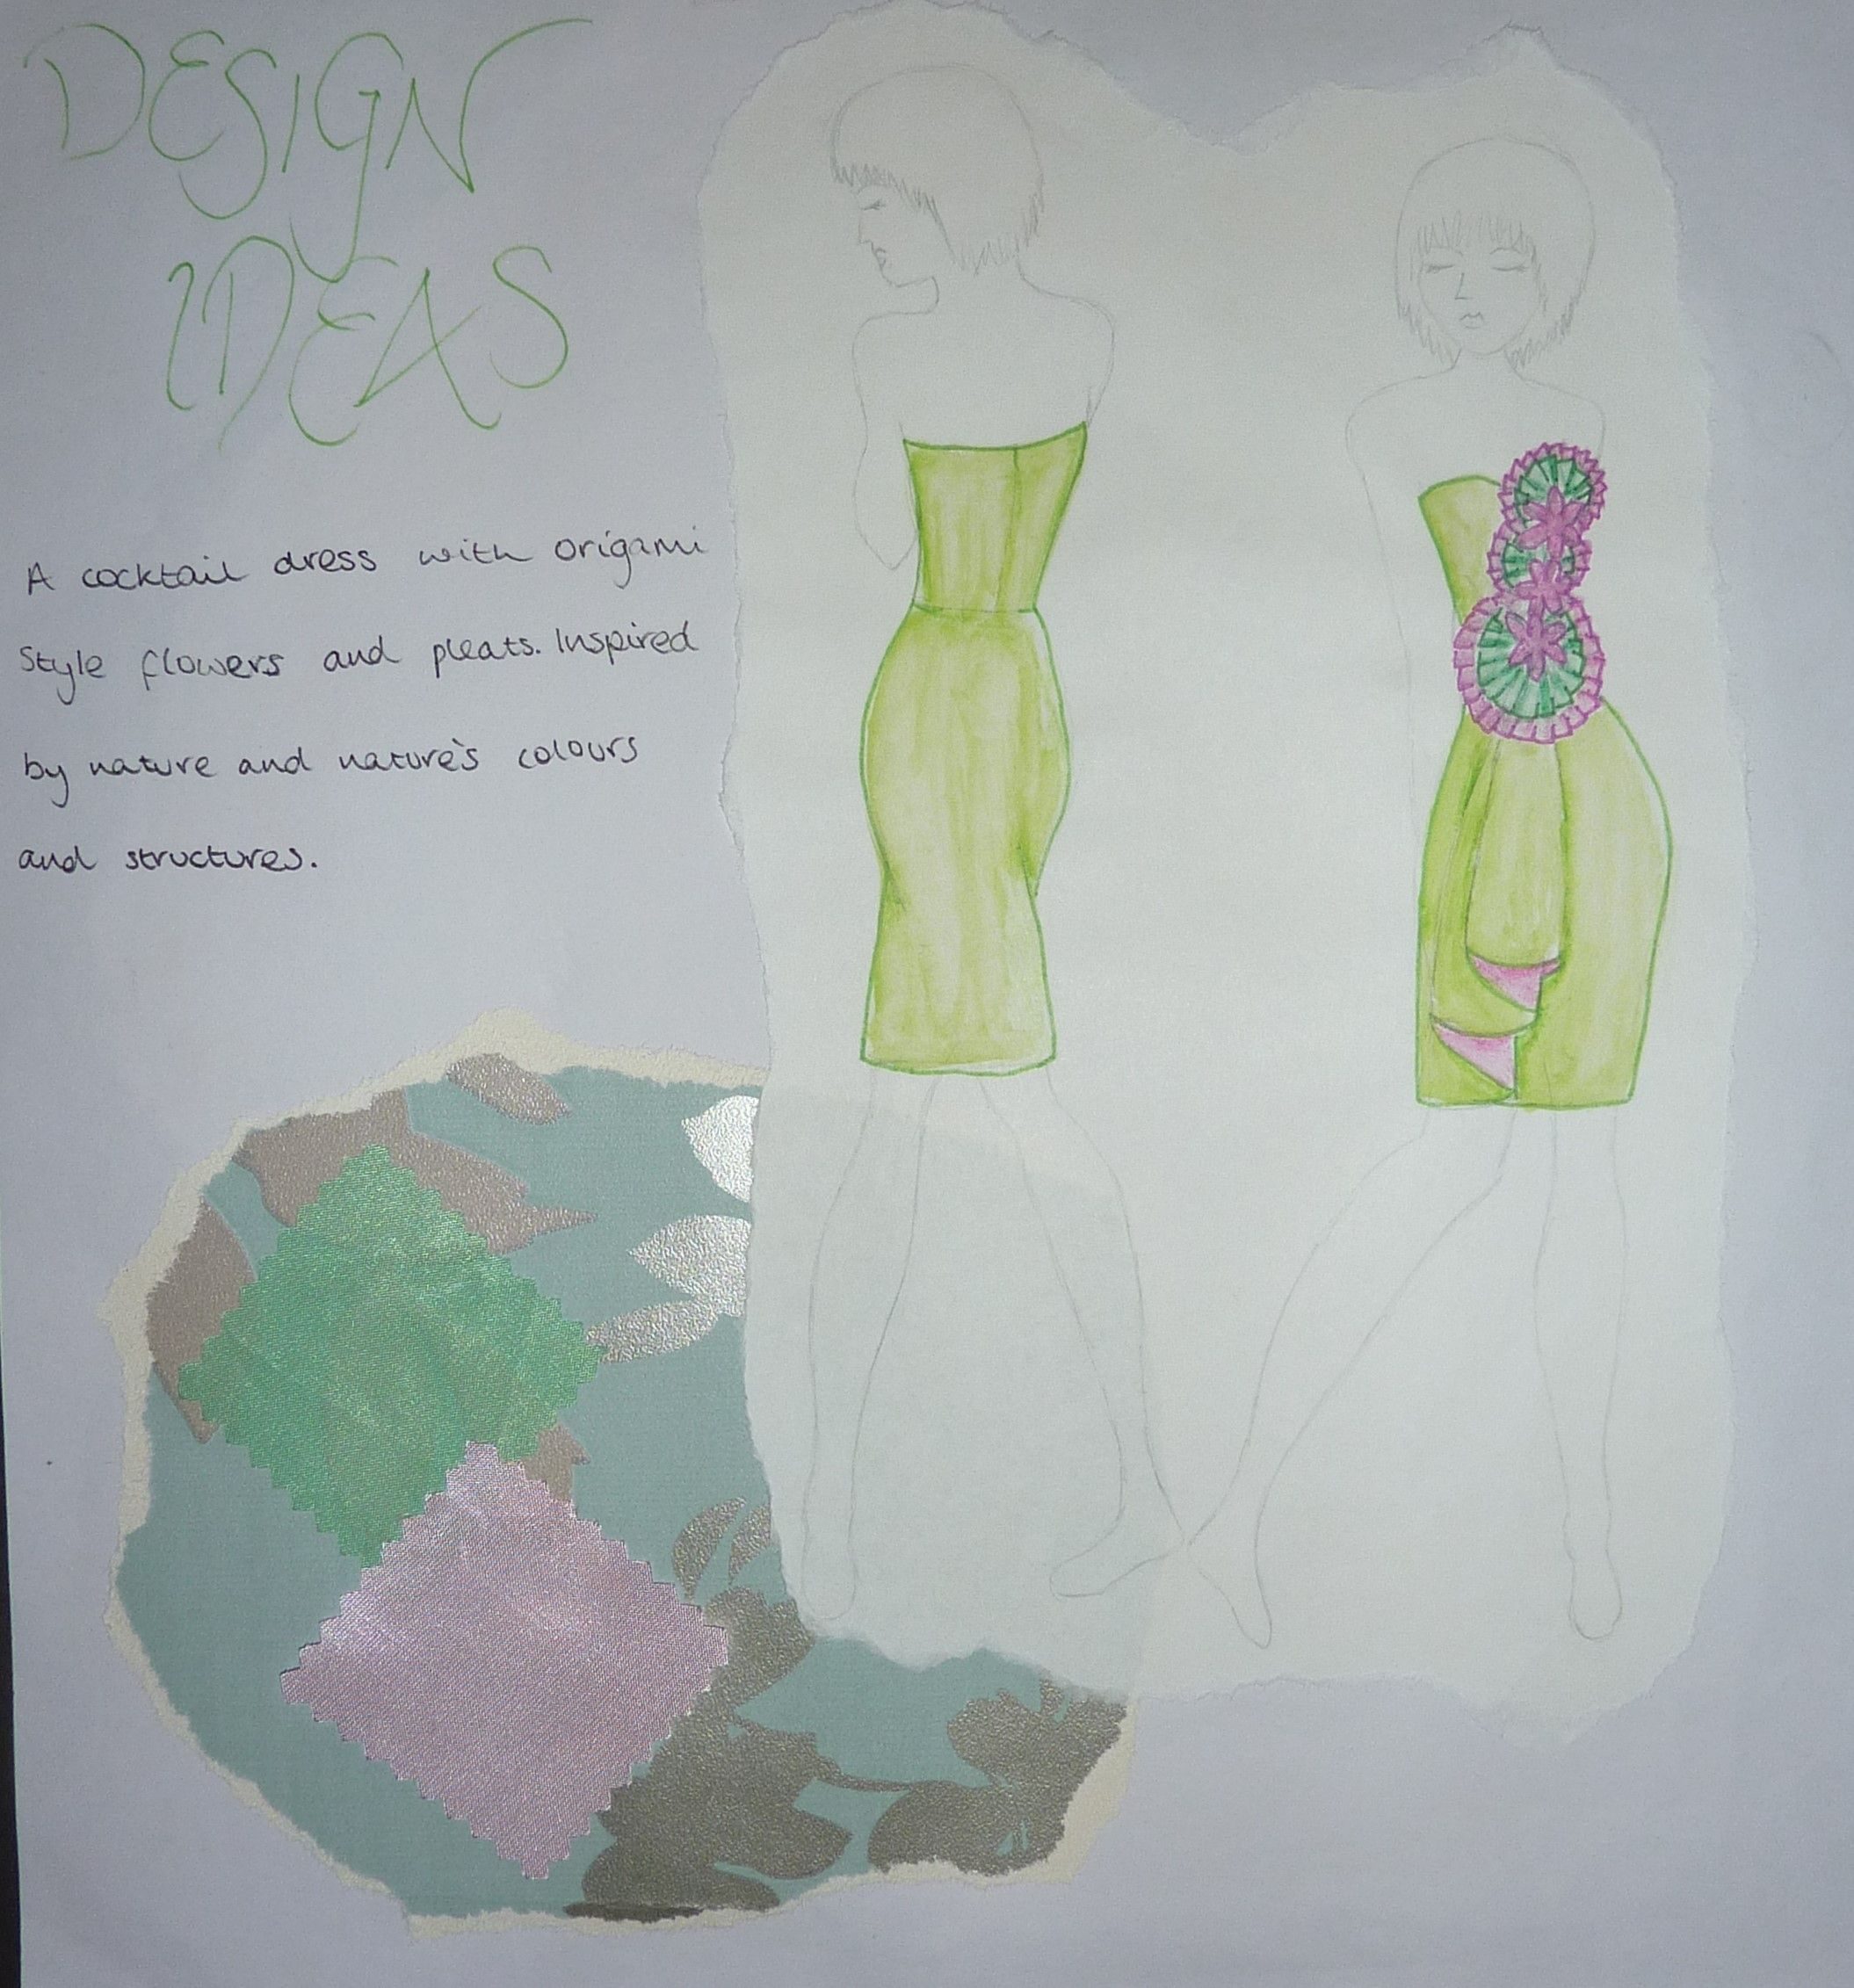 MK Young Fashion Designer of the Year 2010/11 - Design Idea